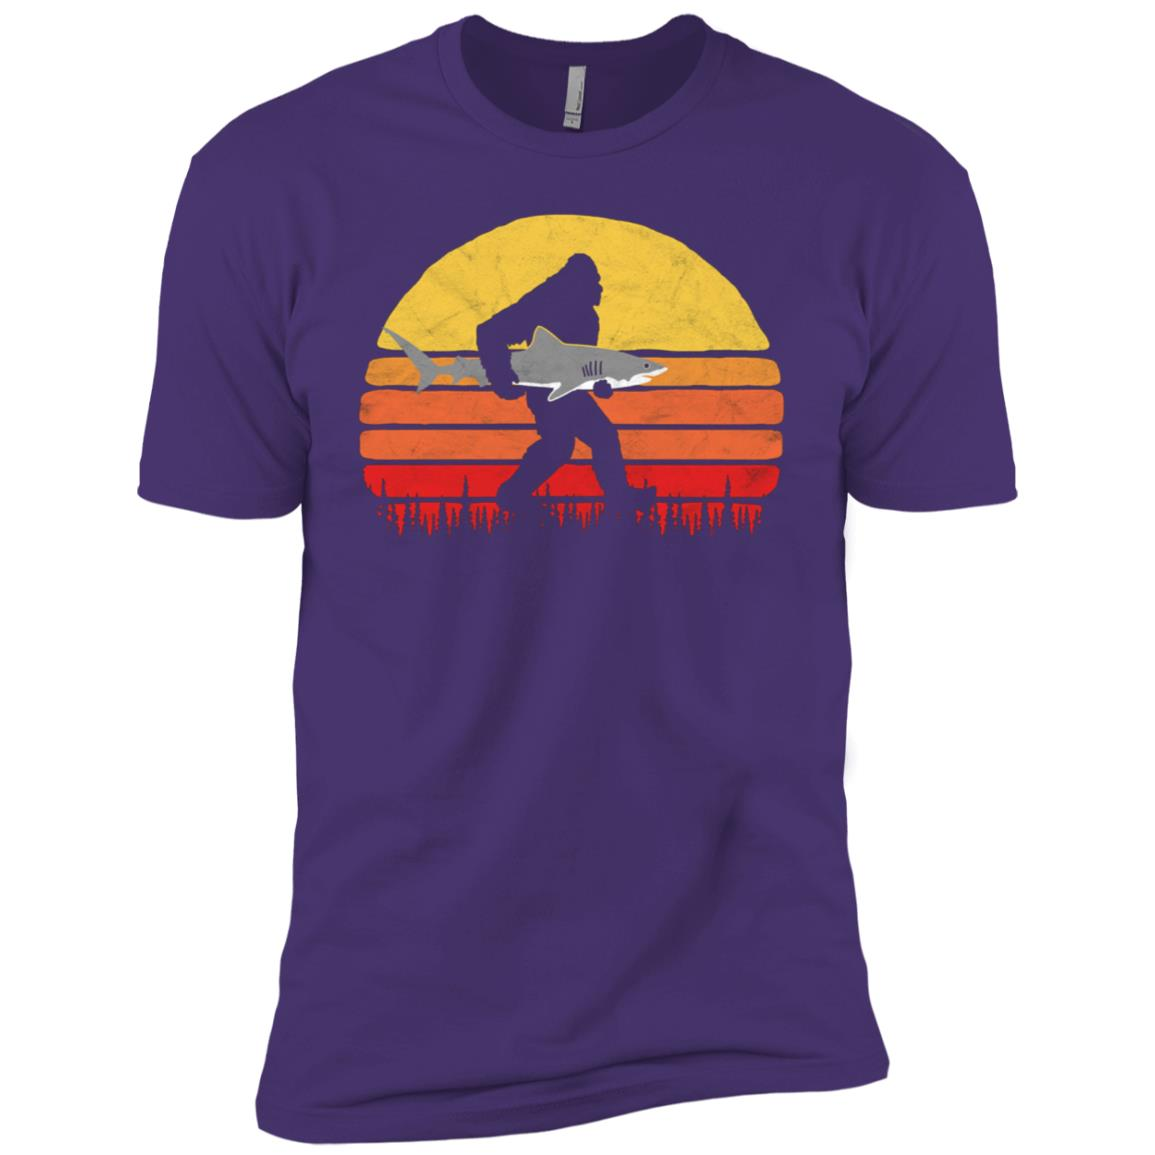 Bigfoot Silhouette & Great White Shark Sun Men Short Sleeve T-Shirt